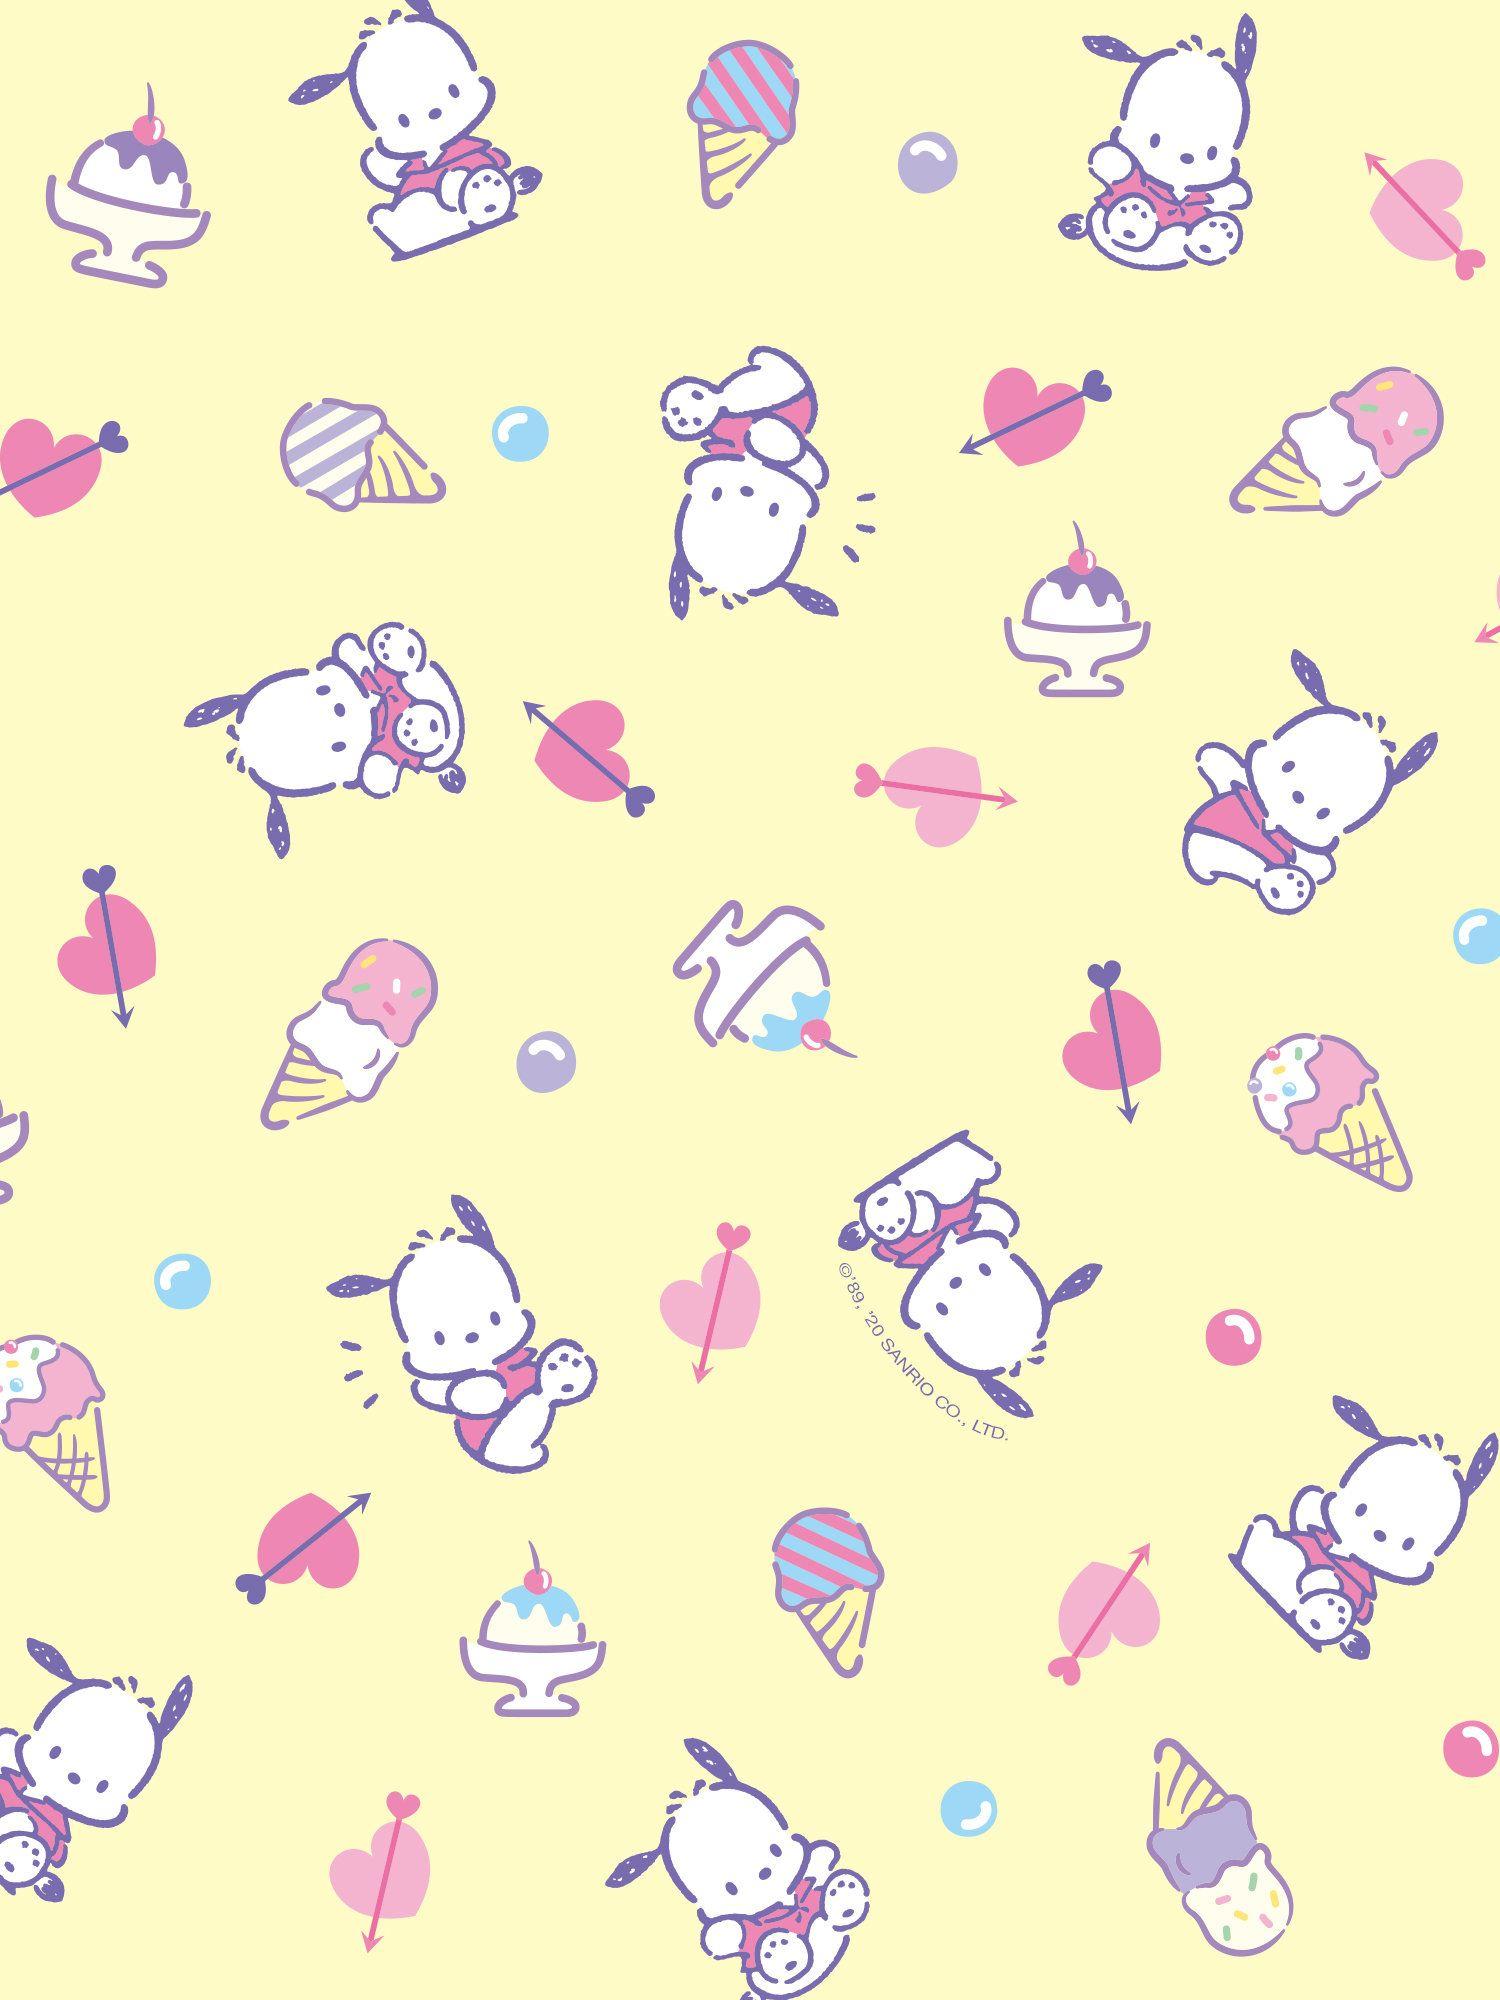 Wallpapers Sanrio おしゃれまとめの人気アイデア Pinterest クニエダマキ クロミ 壁紙 サンリオ 壁紙 サンリオ イラスト